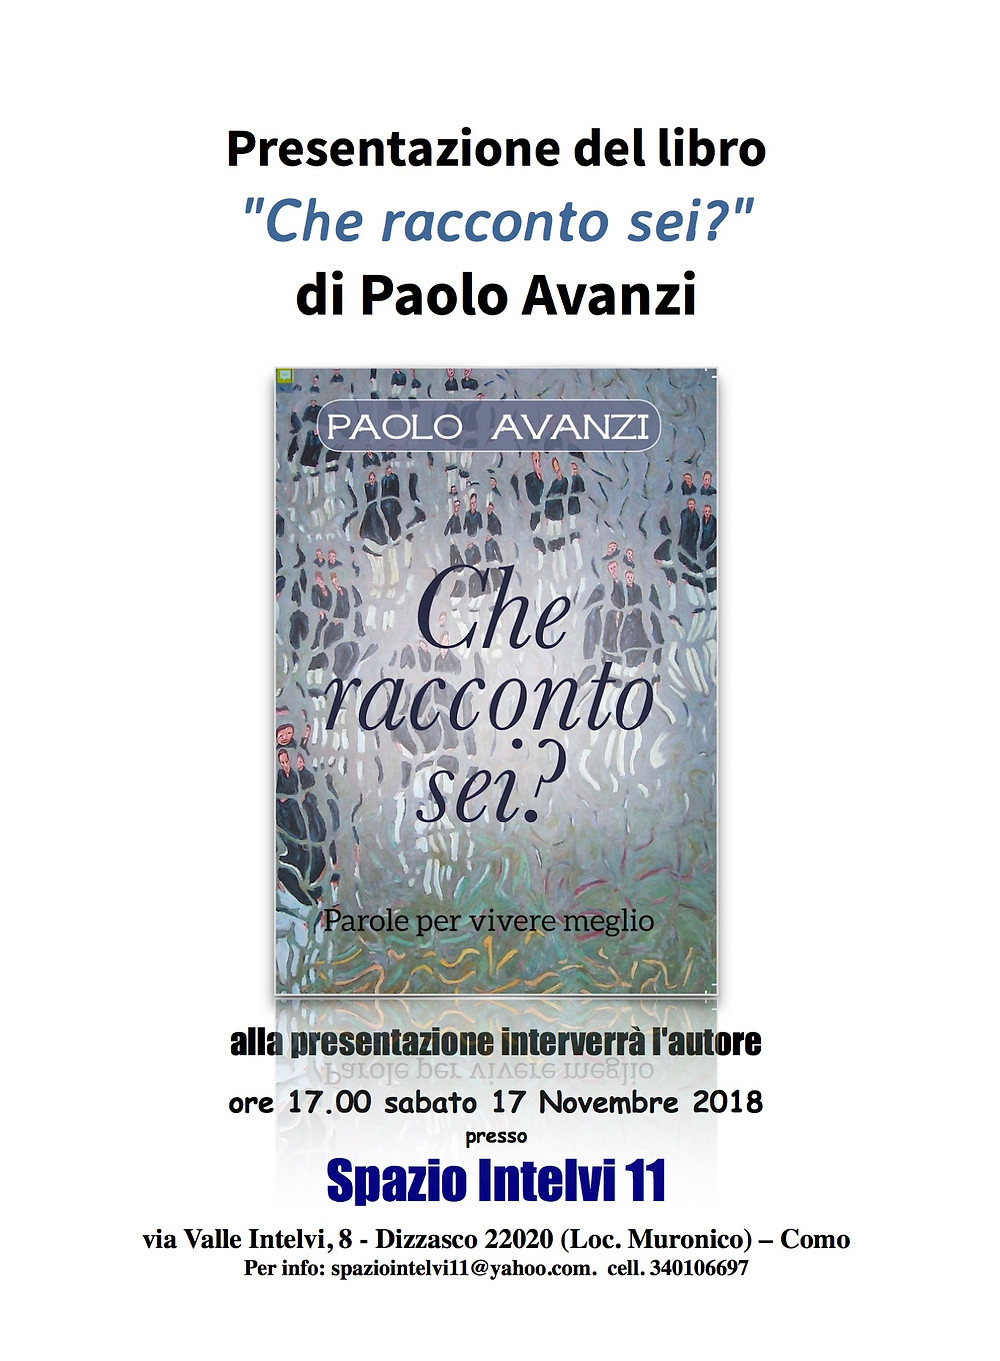 Che racconto sei? Paolo Avanzi